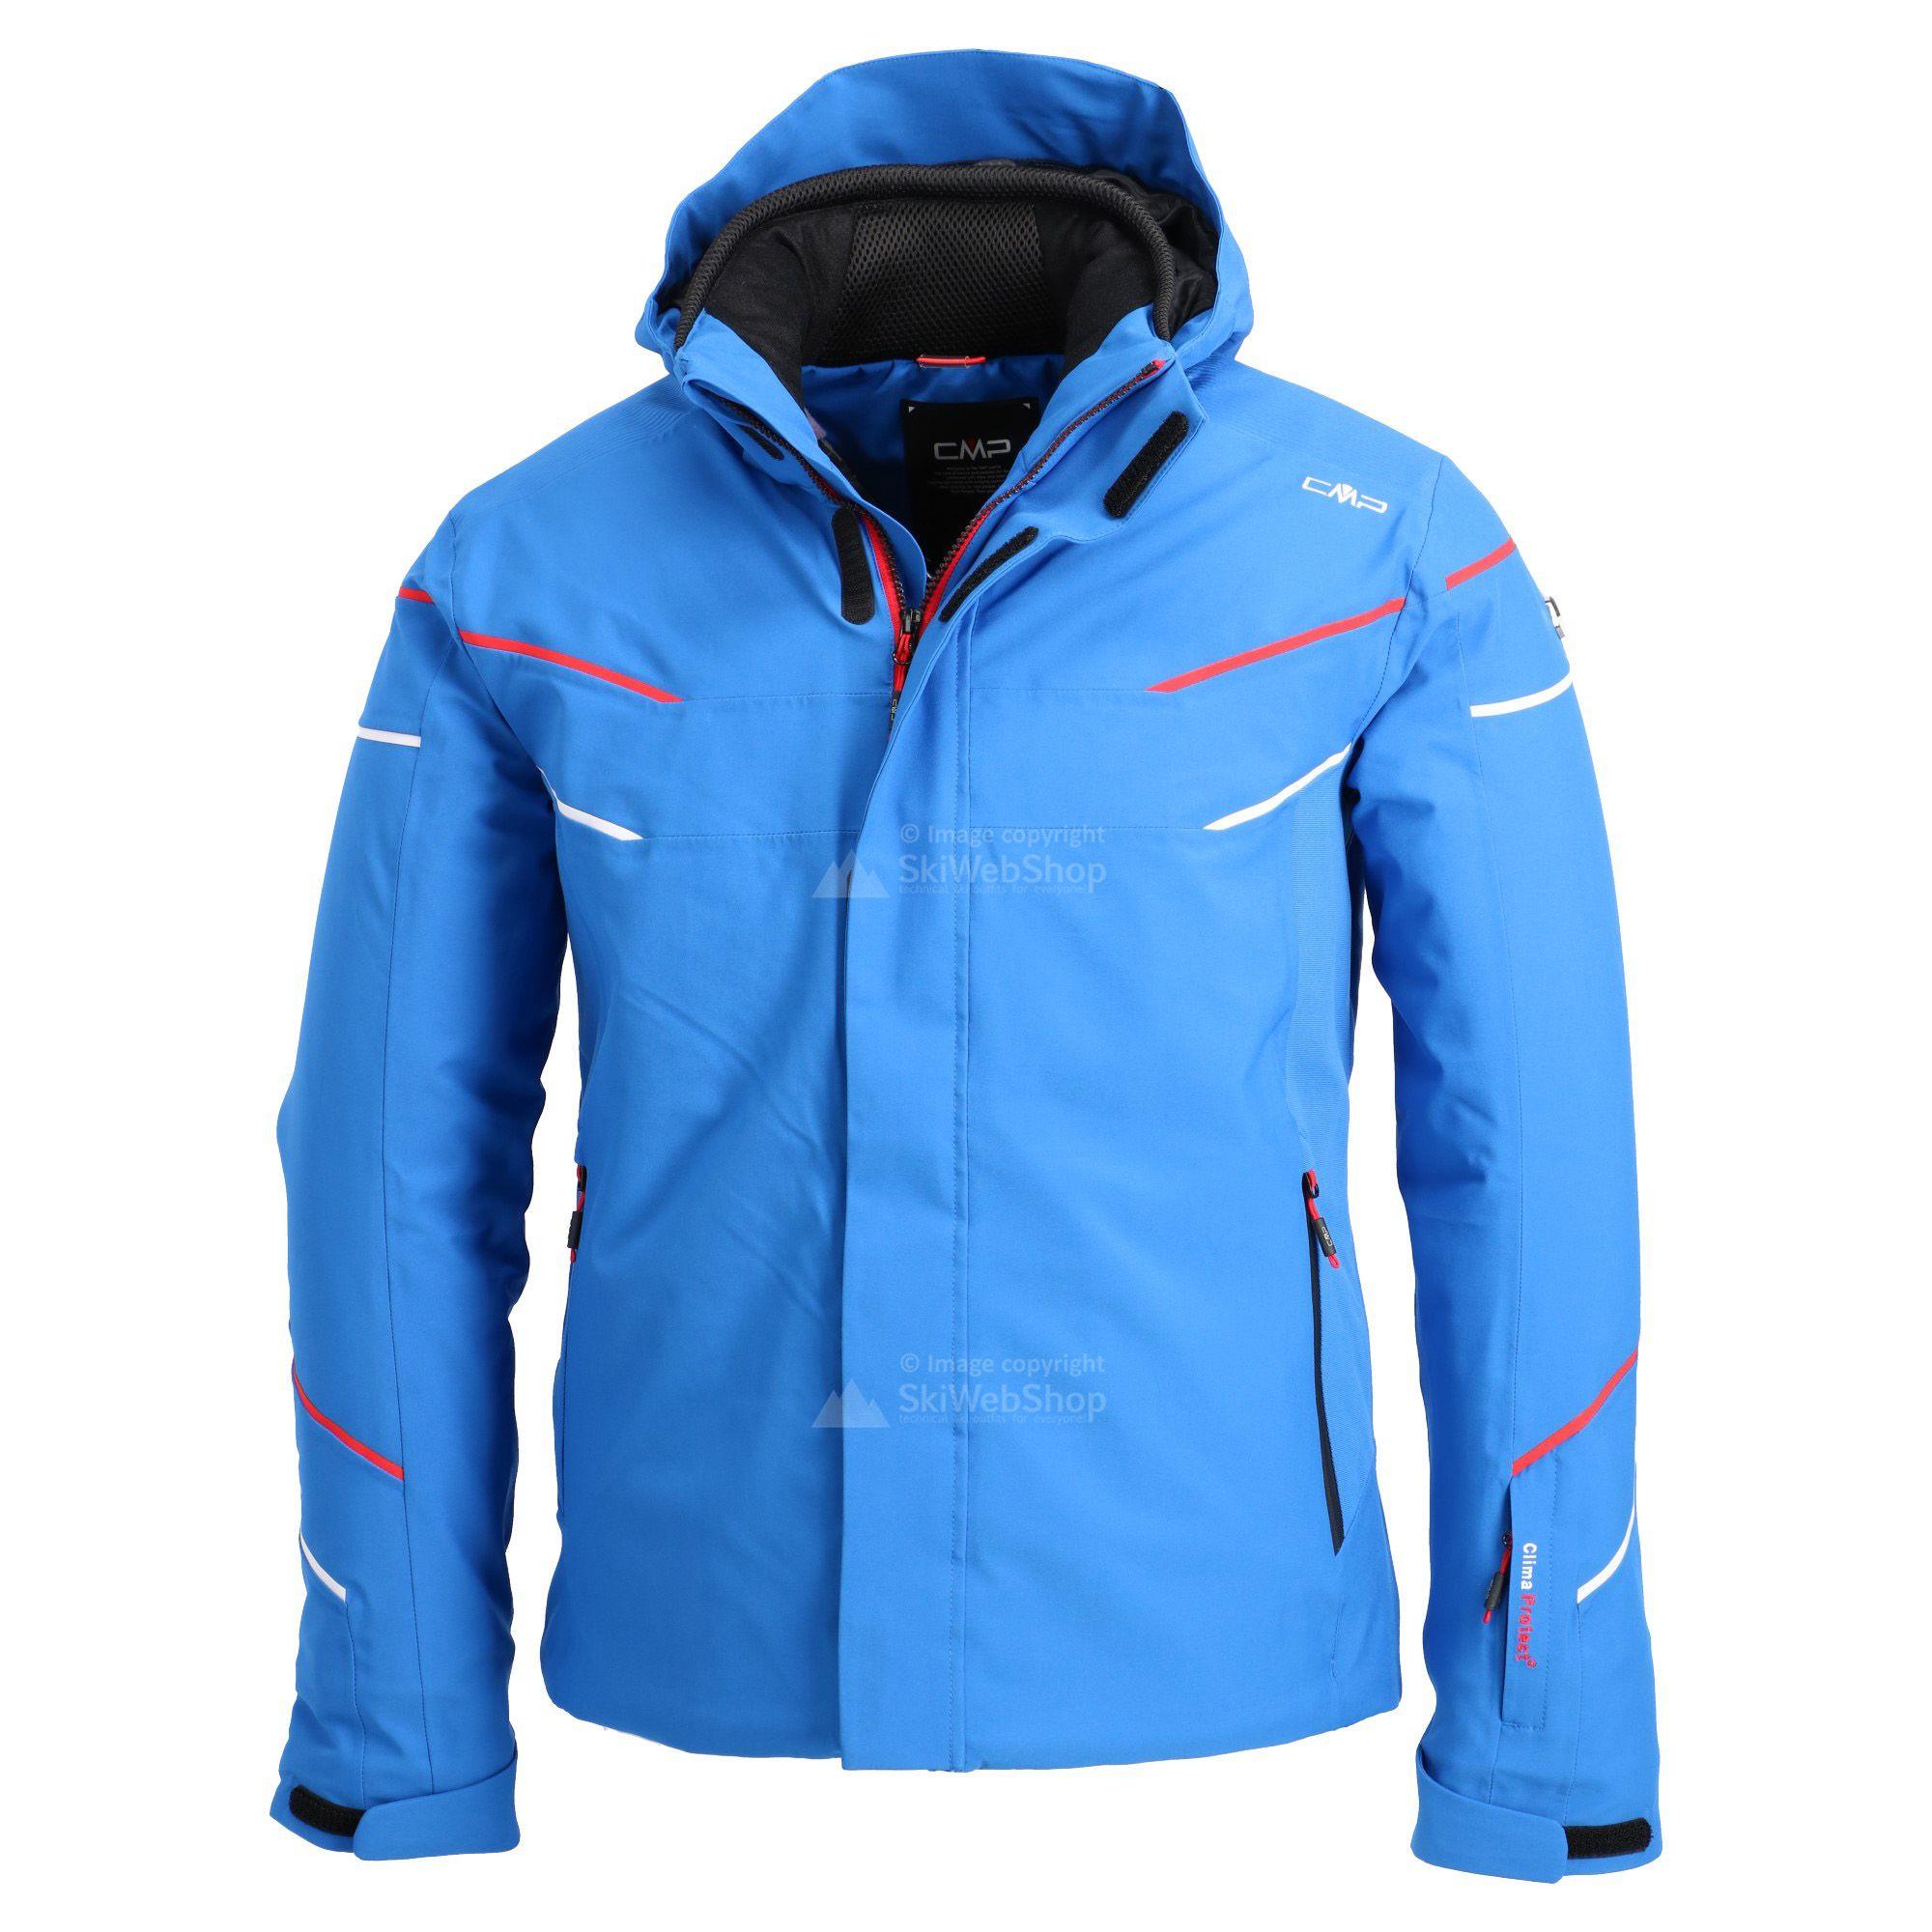 Cmp Ski Jacket Men Royal Blue Ferrari Red White Skiwebshopskiwebshop Com